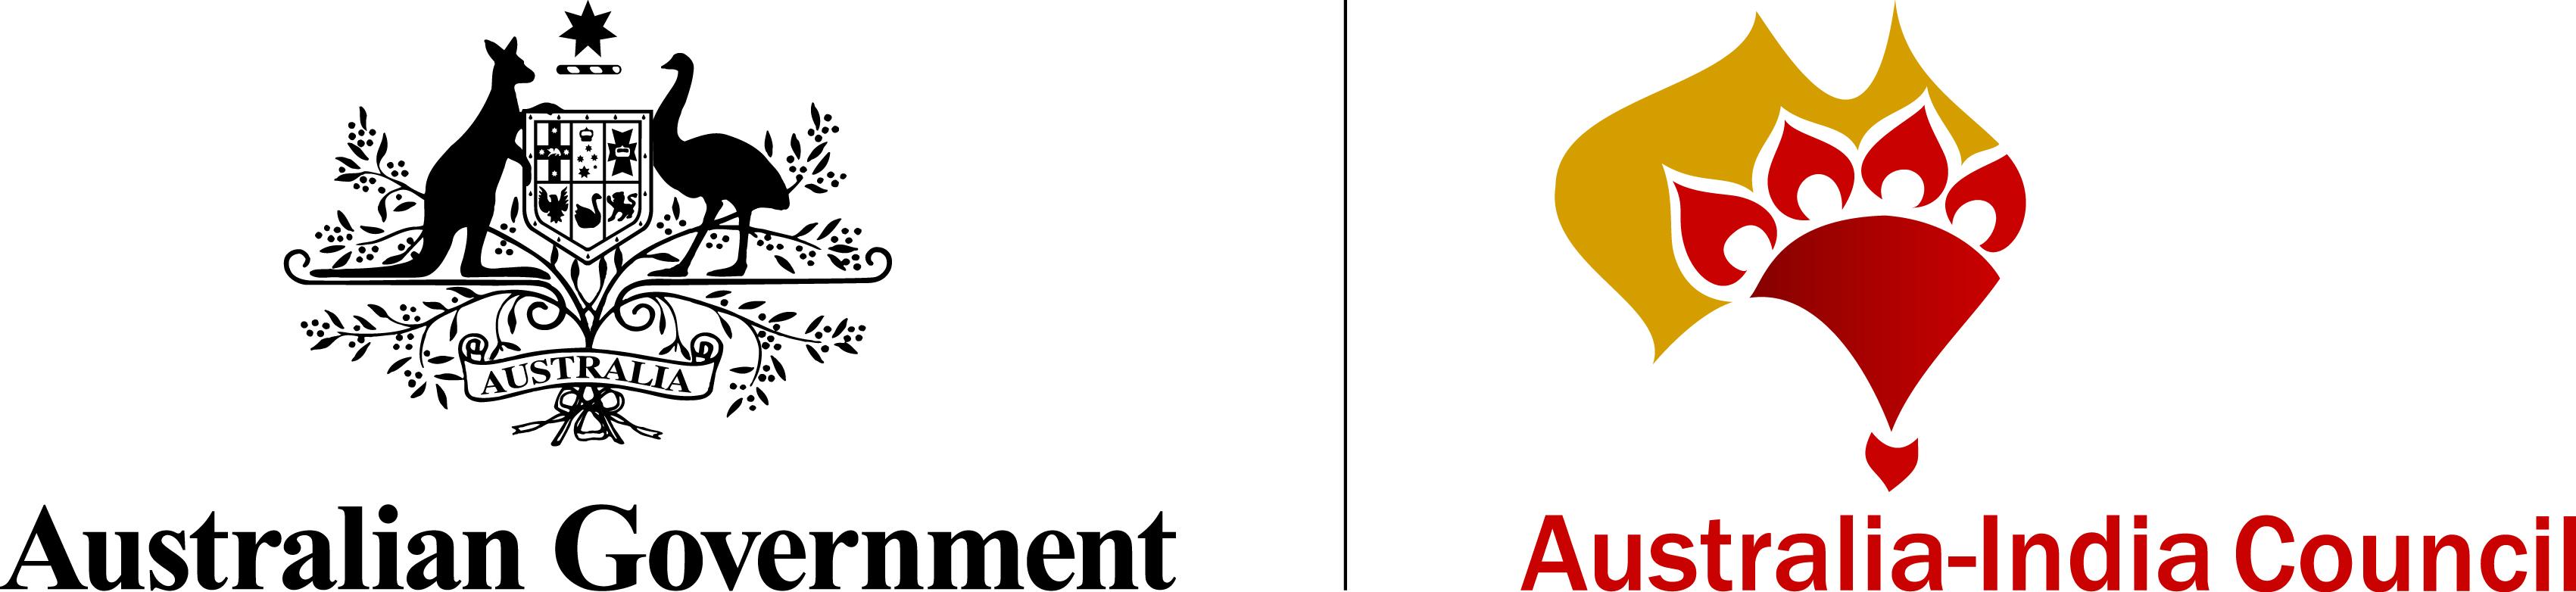 Australia India Council logo